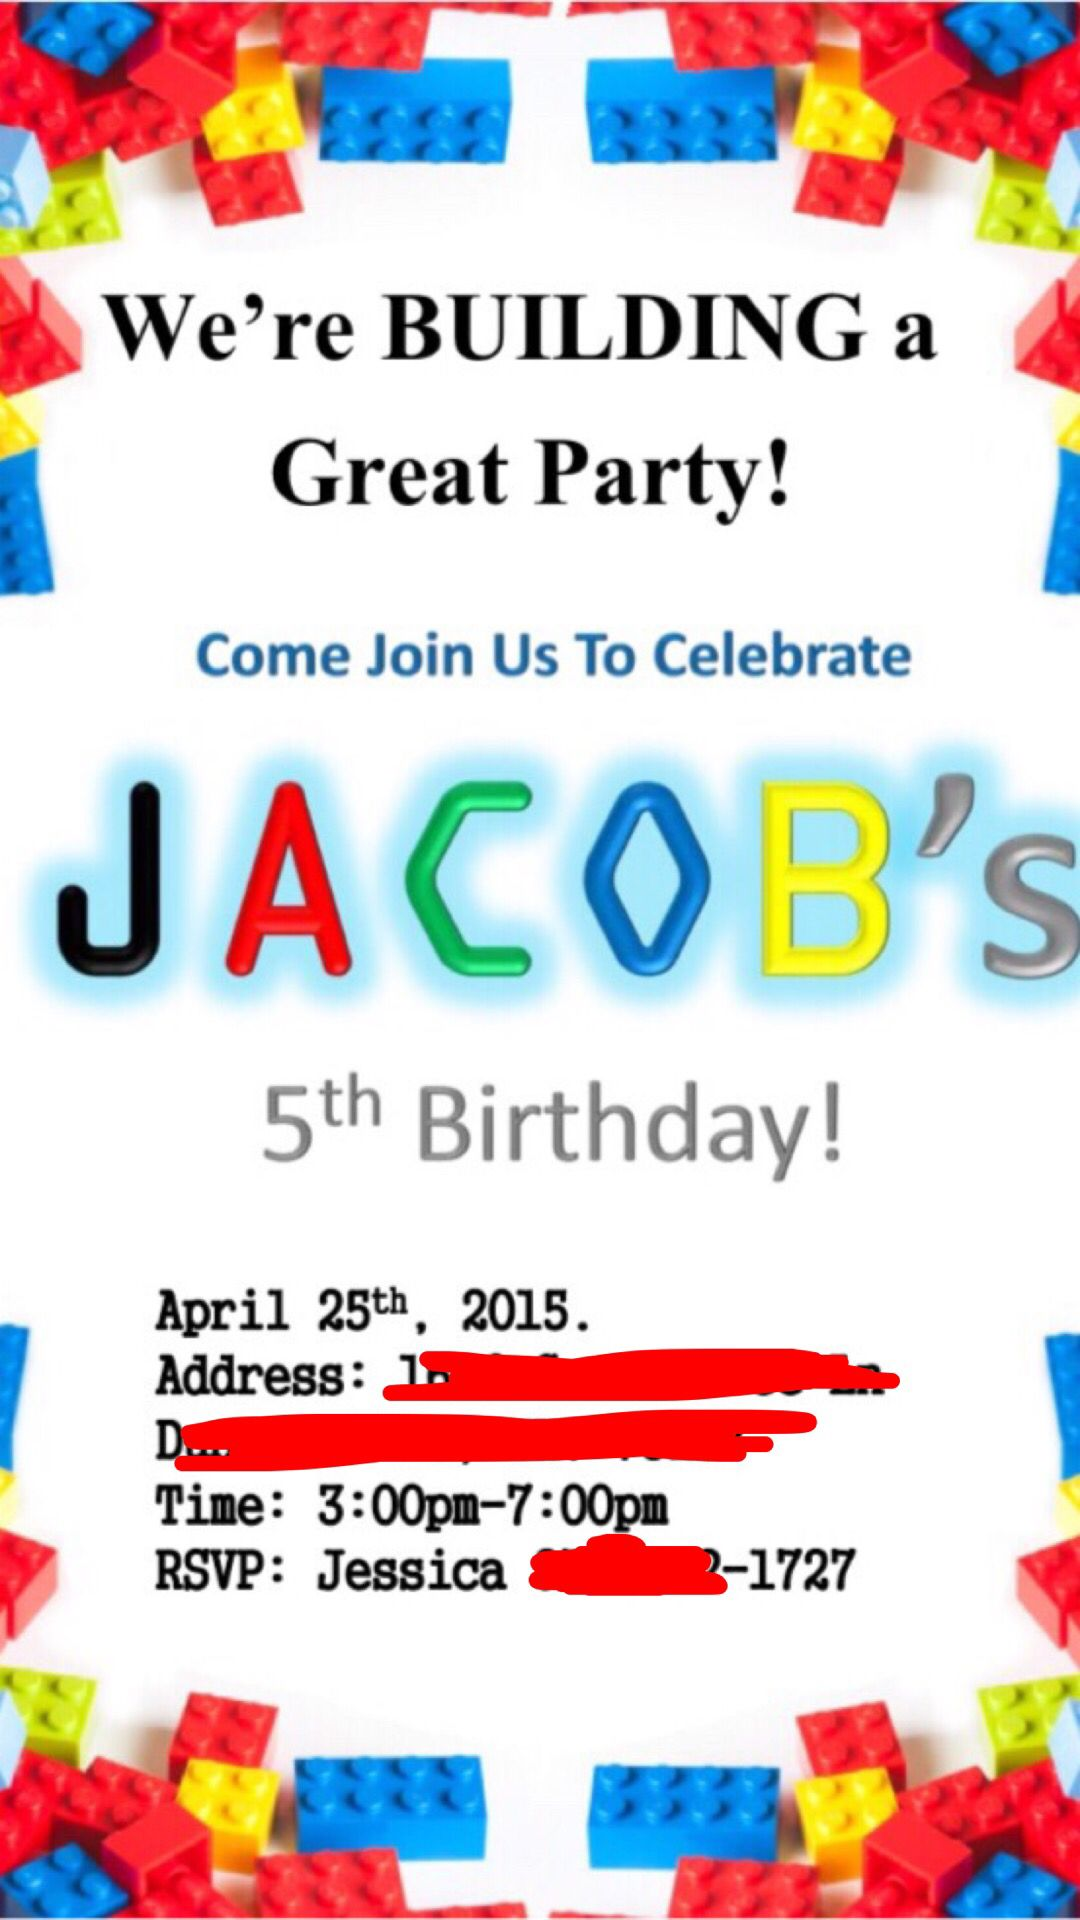 Lego invite free printable | Lego Movie birthday party | Pinterest ...